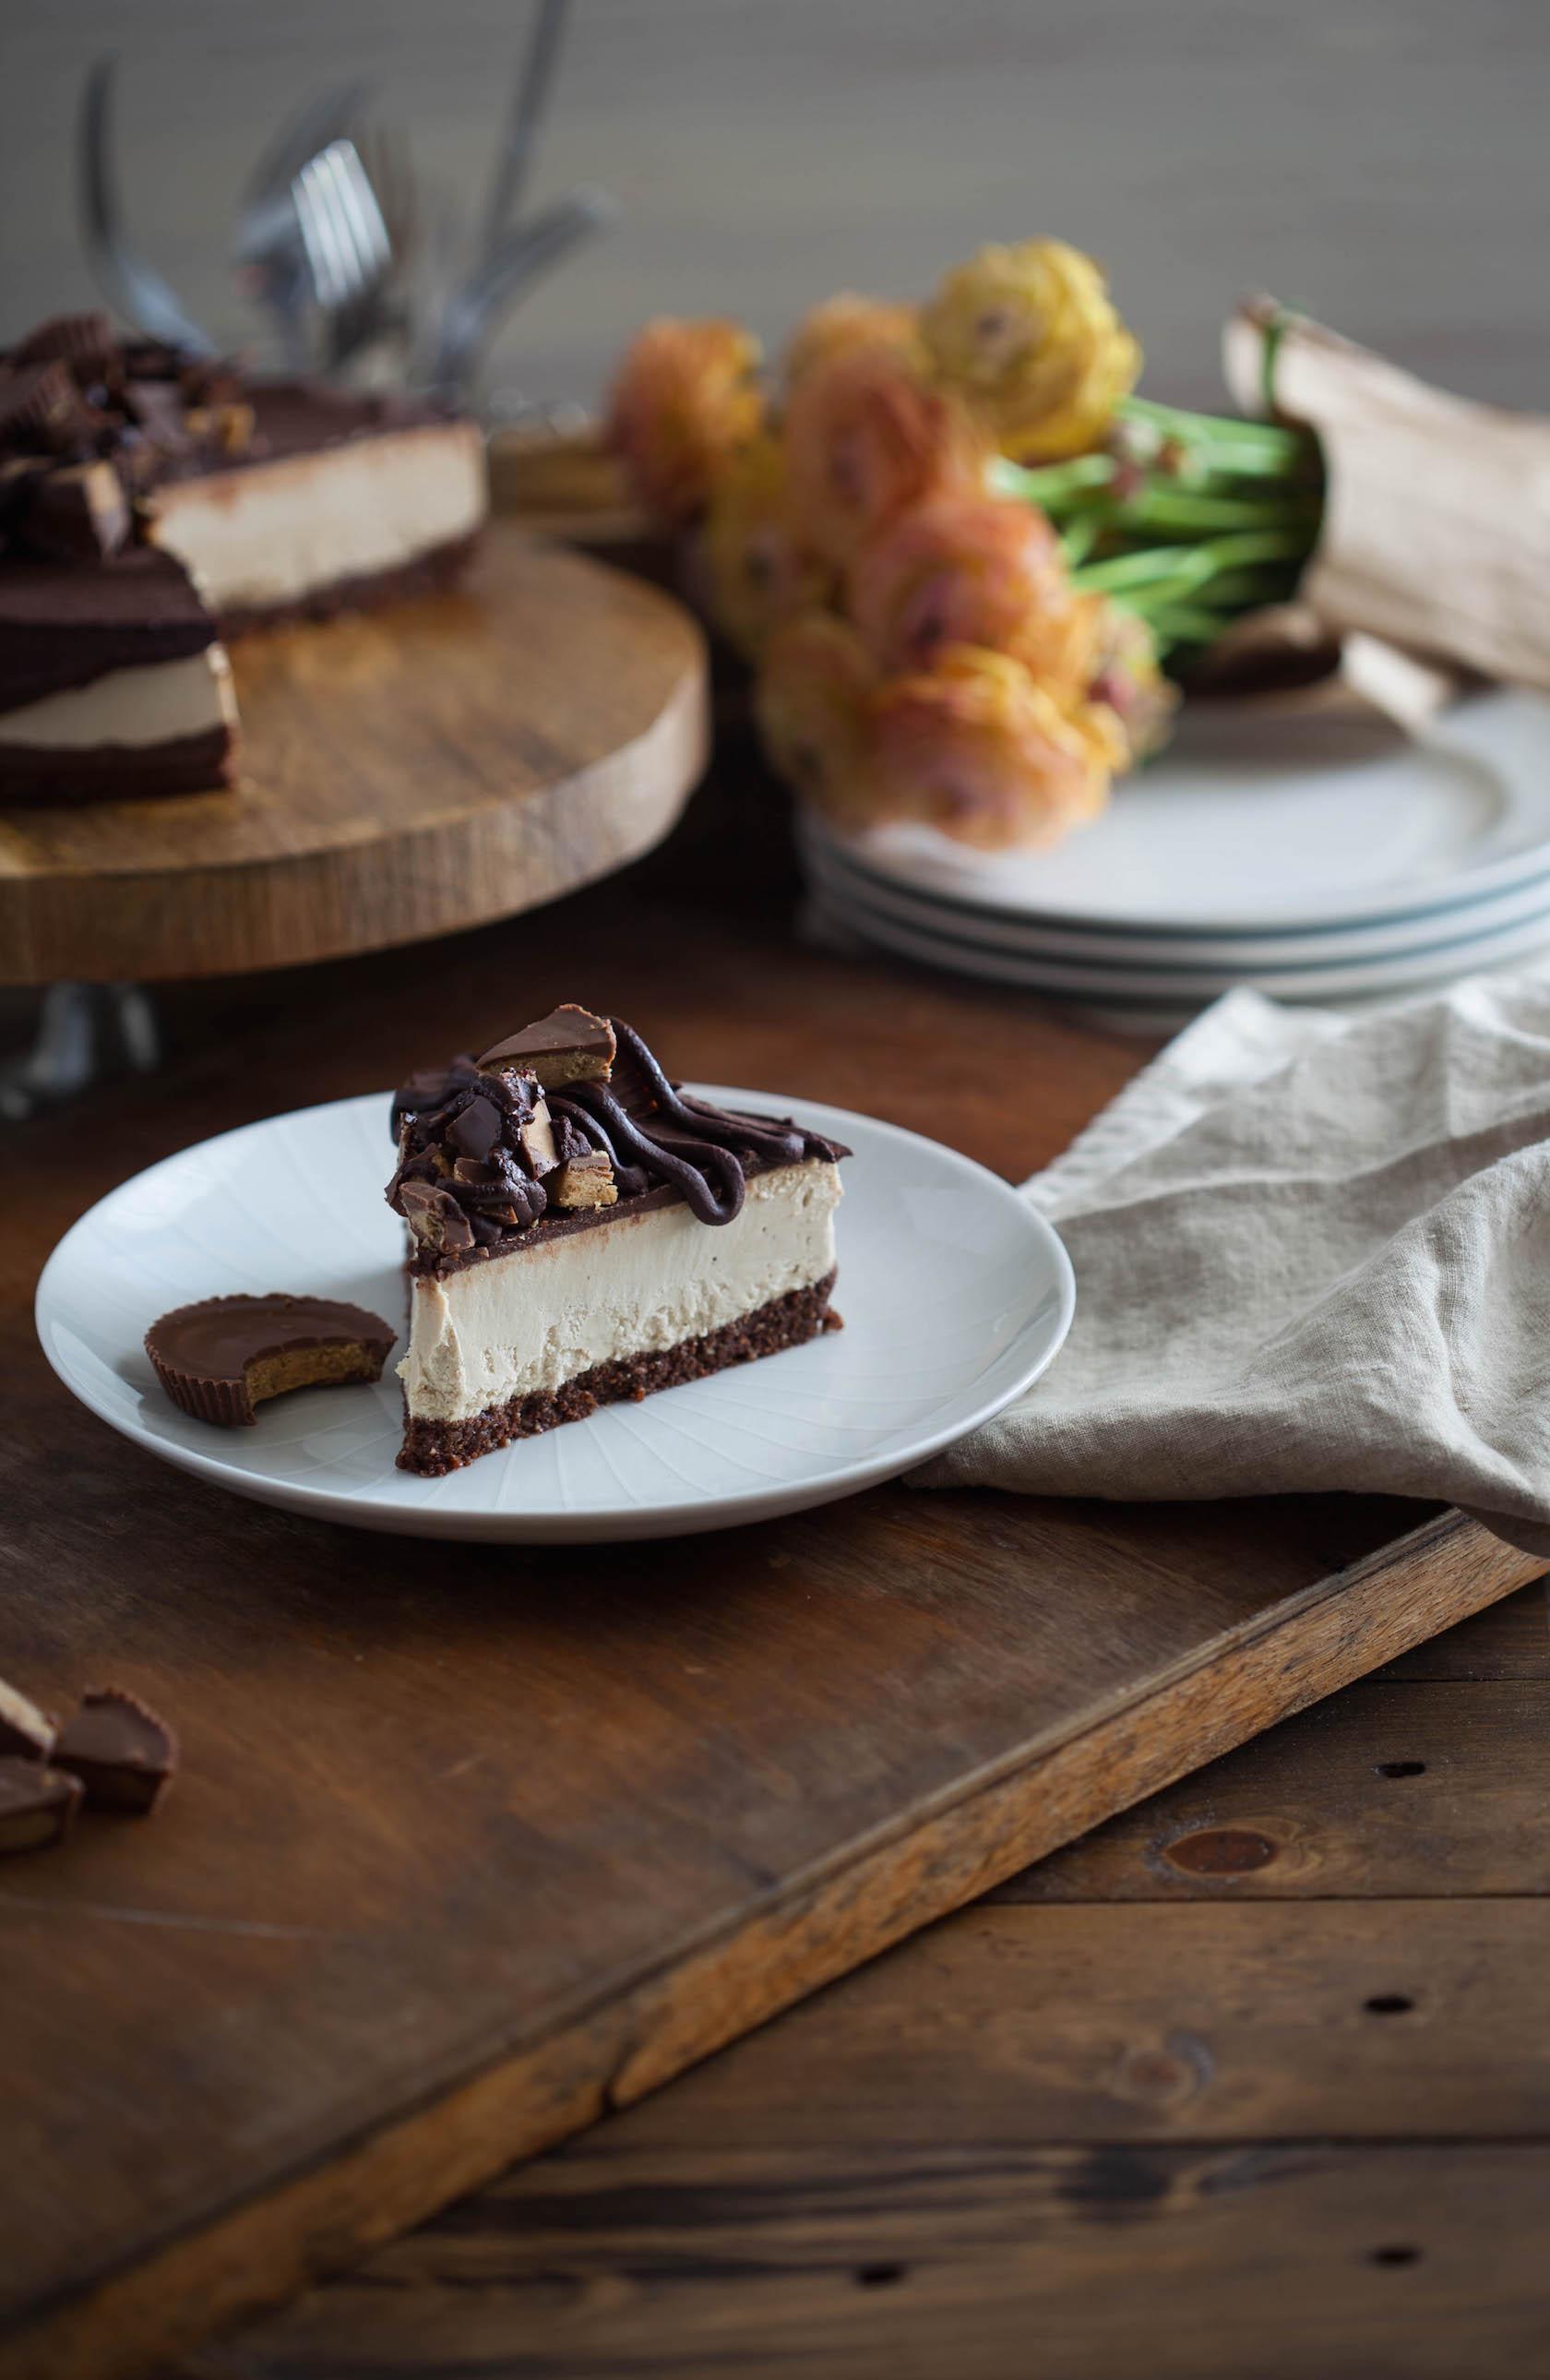 Reese's Cheesecake 3